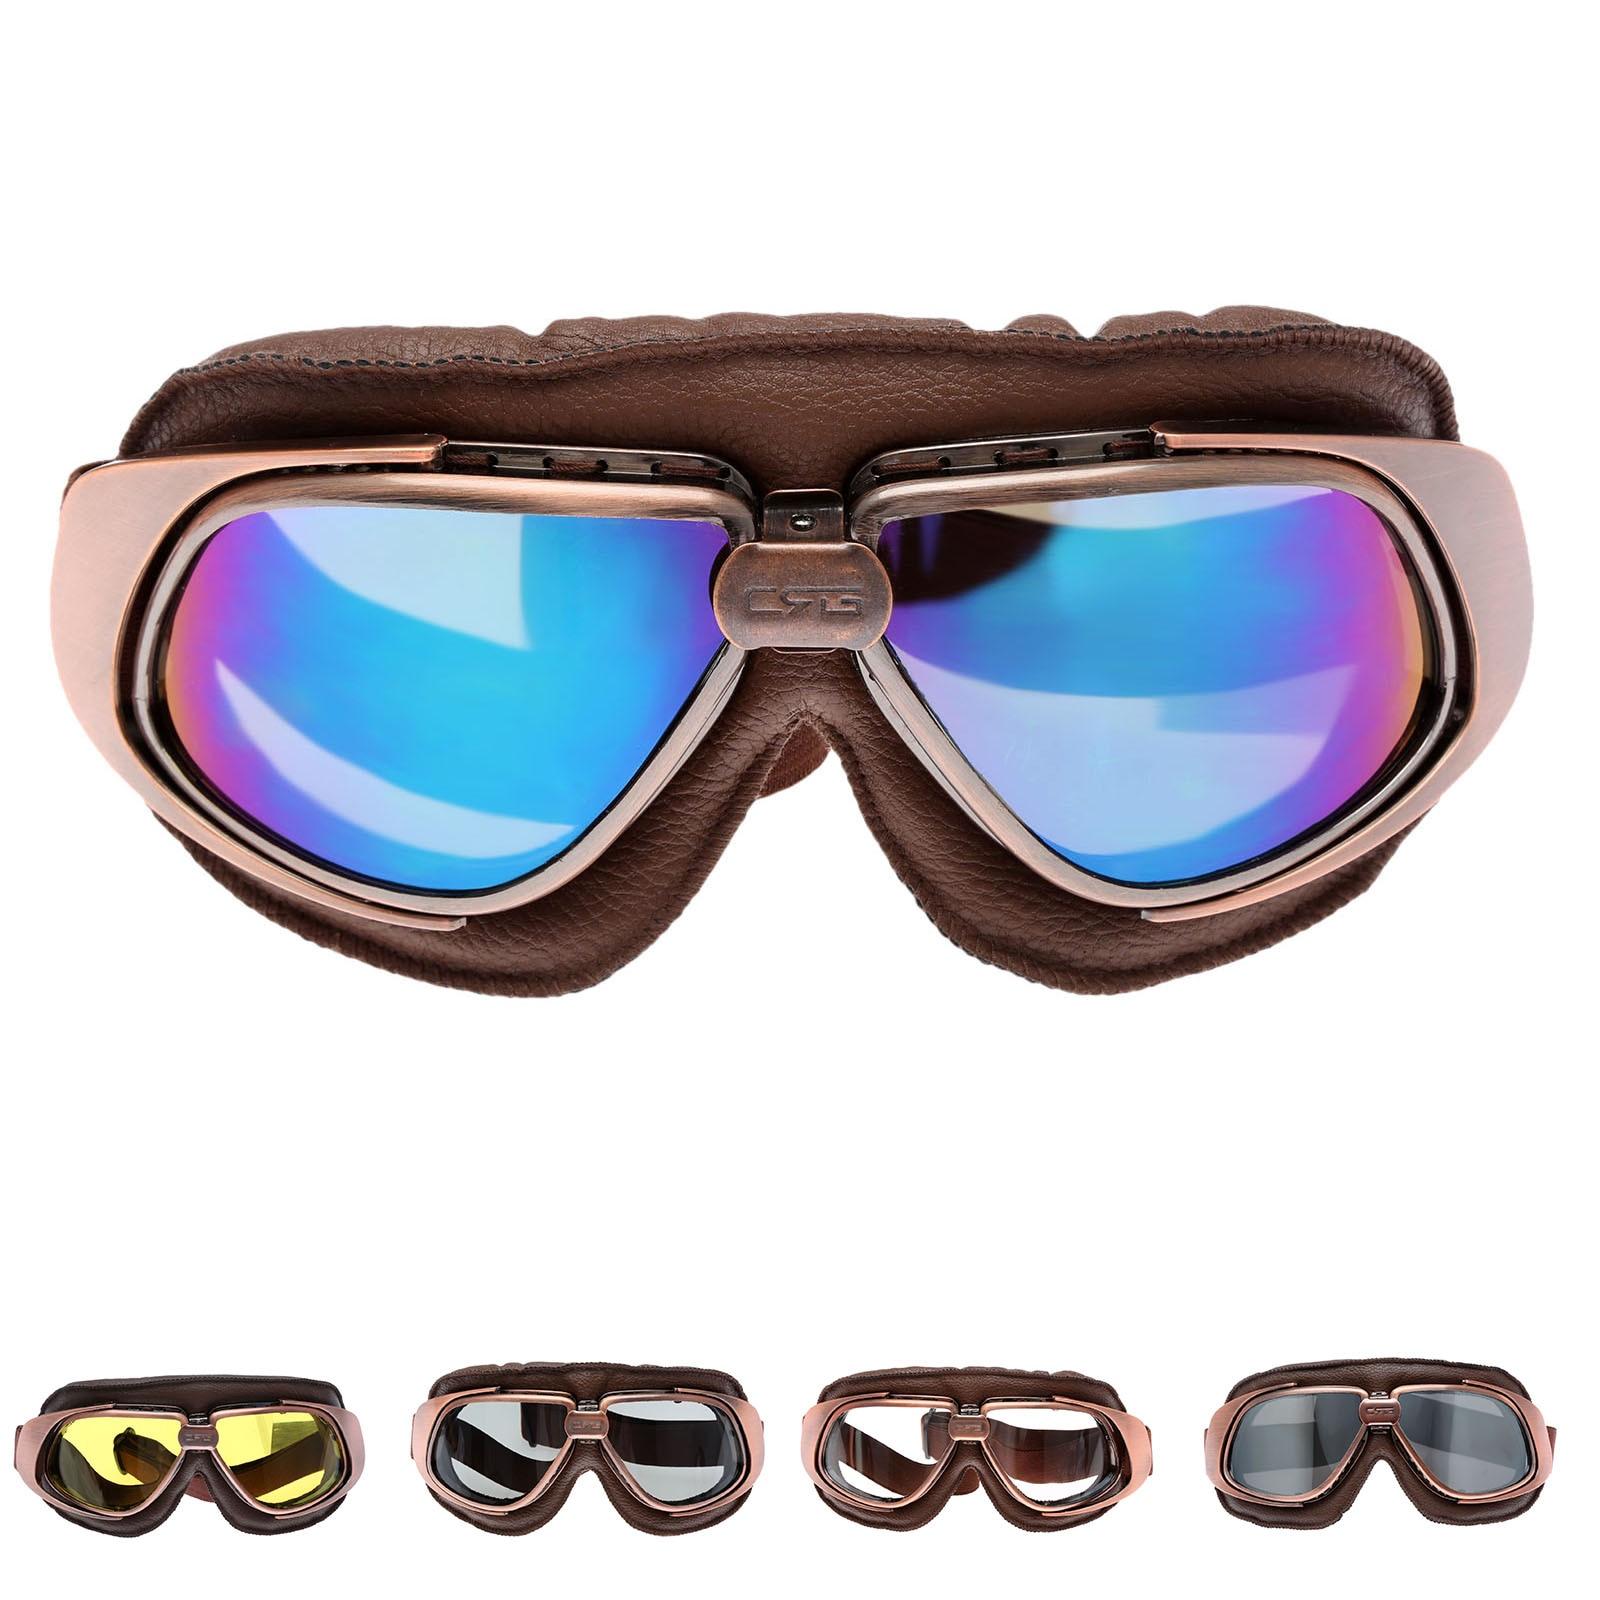 Vintage Motorcycle Goggles Smoking Steampunk Motocross Helmet Glasses UV Protection Sport Ski Skate Goggle Sunglasses in Motorcycle Glasses from Automobiles Motorcycles